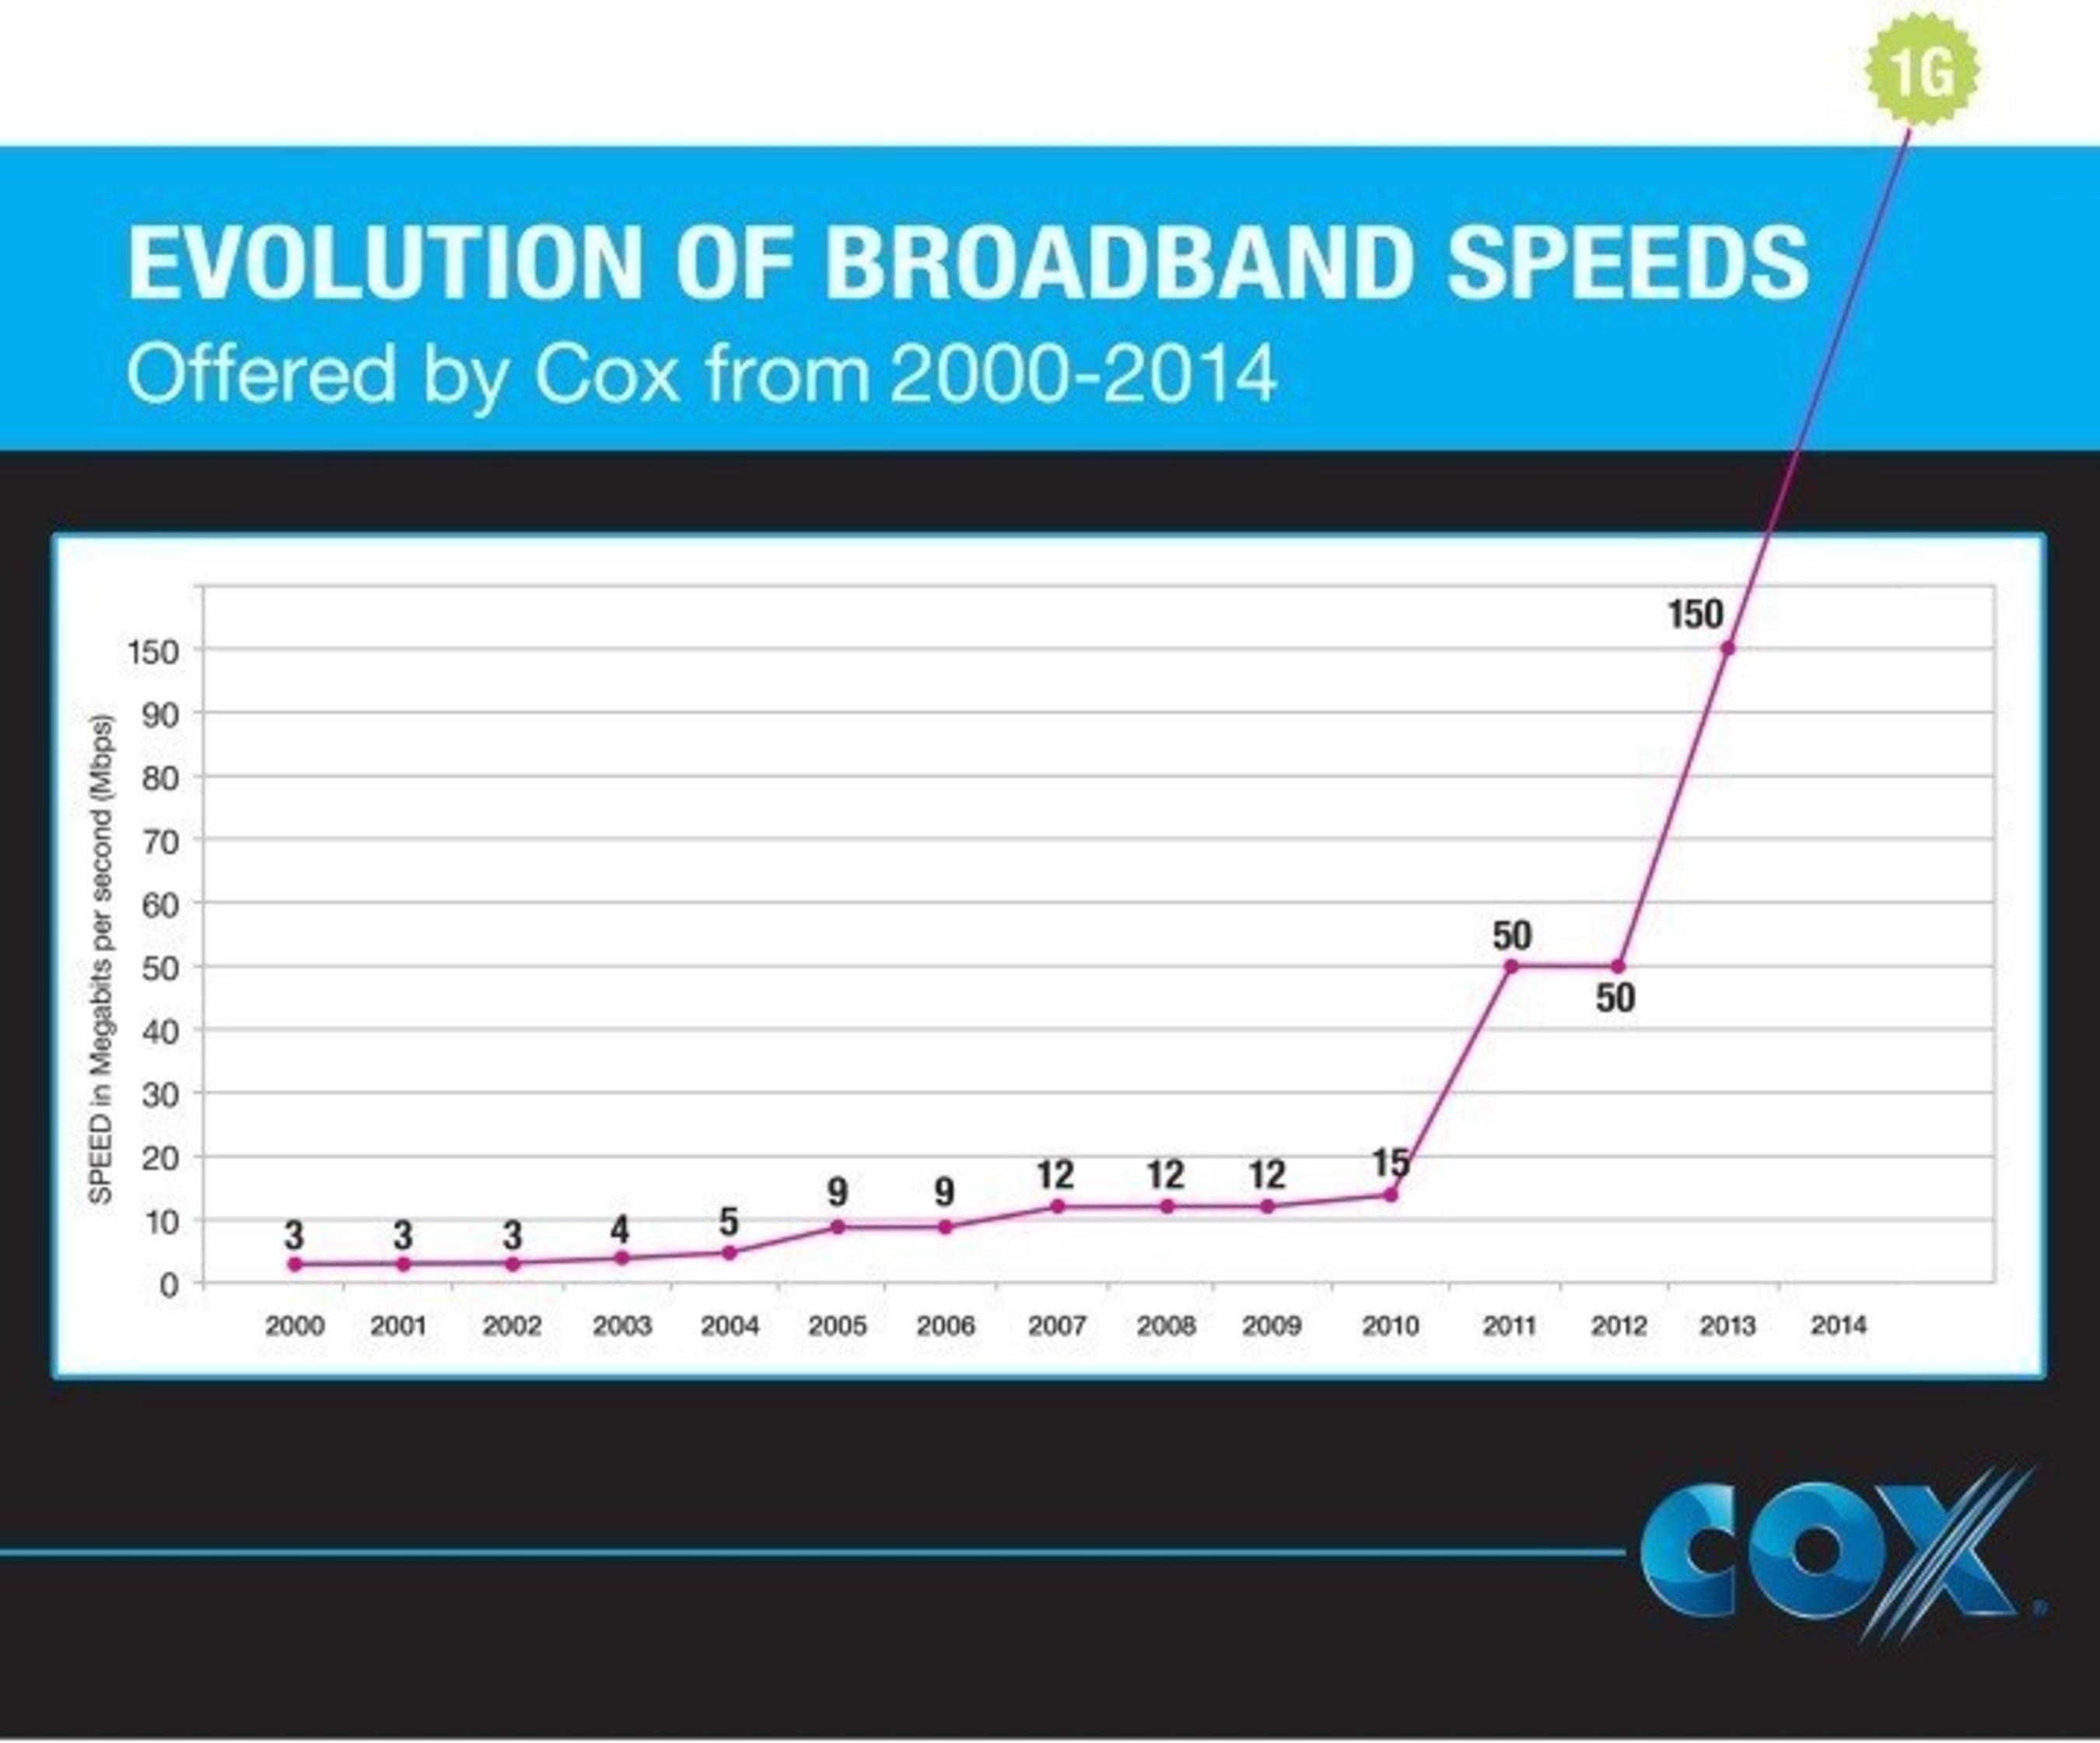 over the past 13 years, cox has increased broadband speeds 1,000%